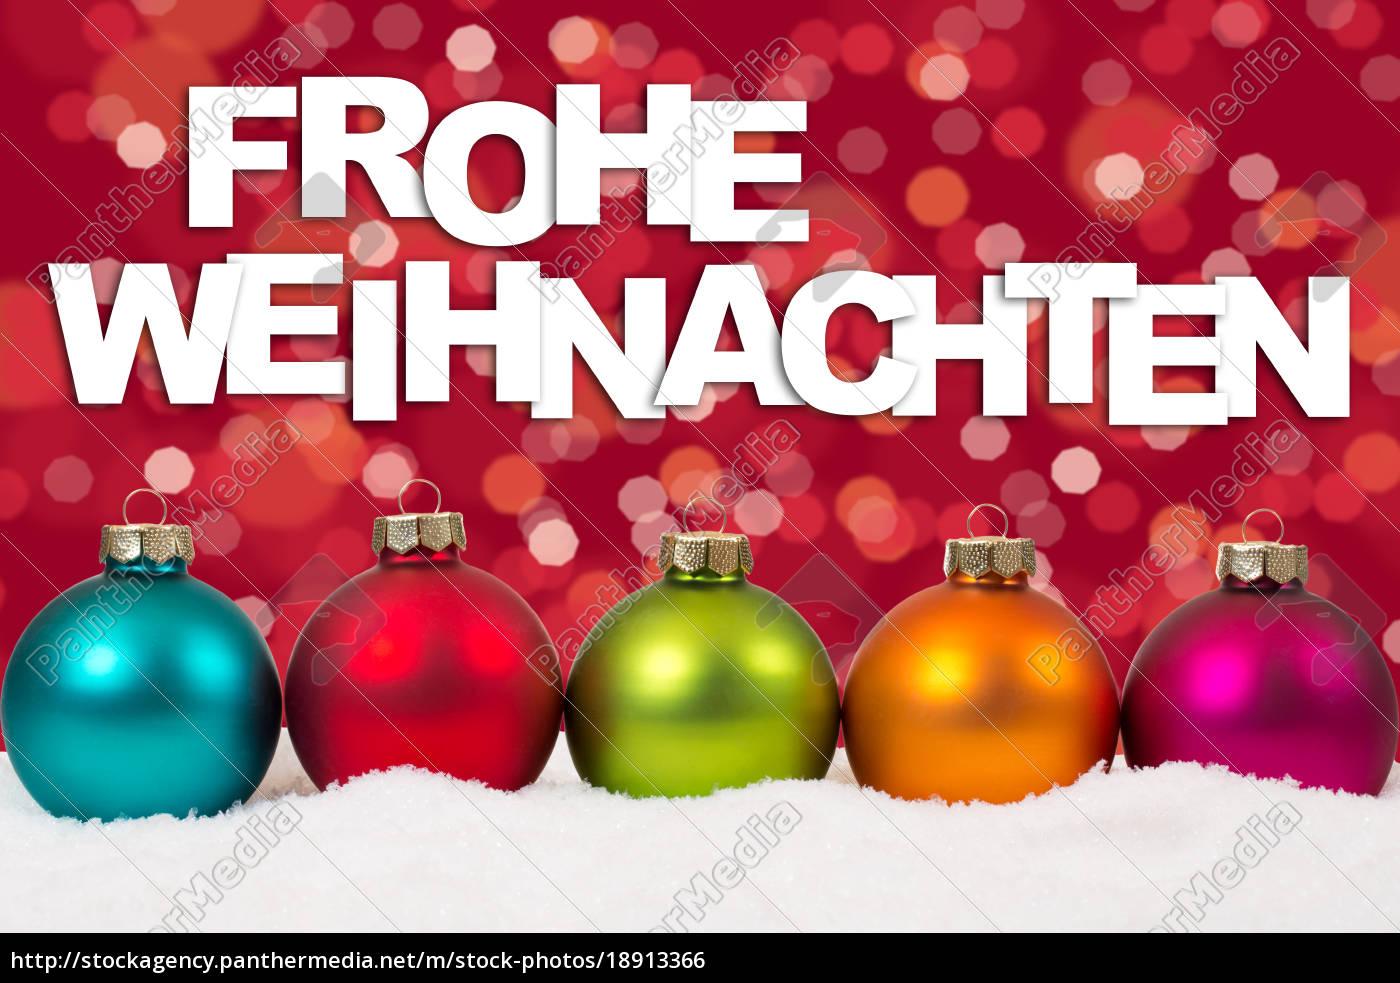 Karte Frohe Weihnachten.Stock Photo 18913366 Frohe Weihnachten Weihnachtskarte Karte Bunte